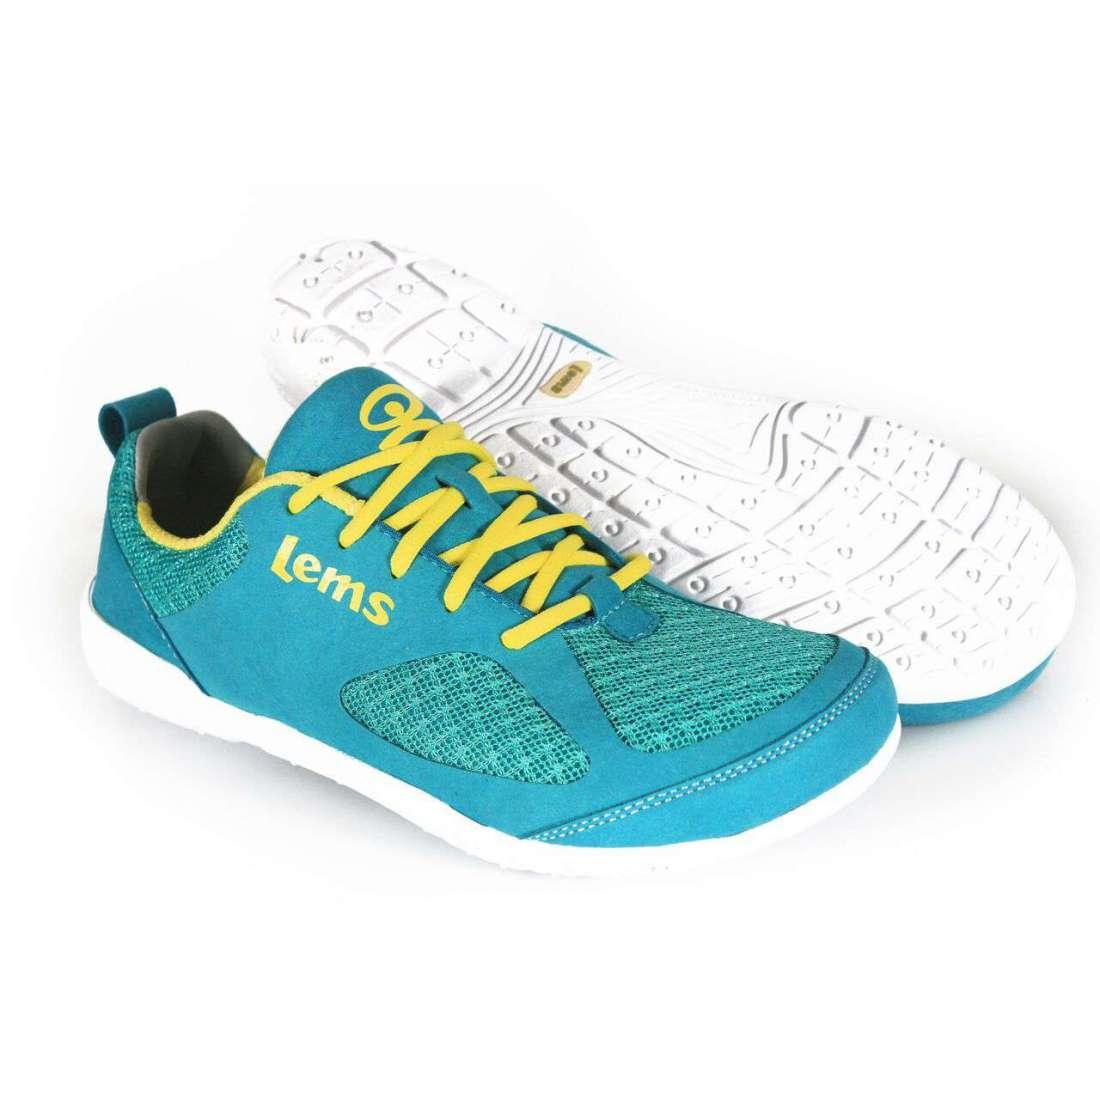 Lems Primal 2 Teal | shoes barefoot